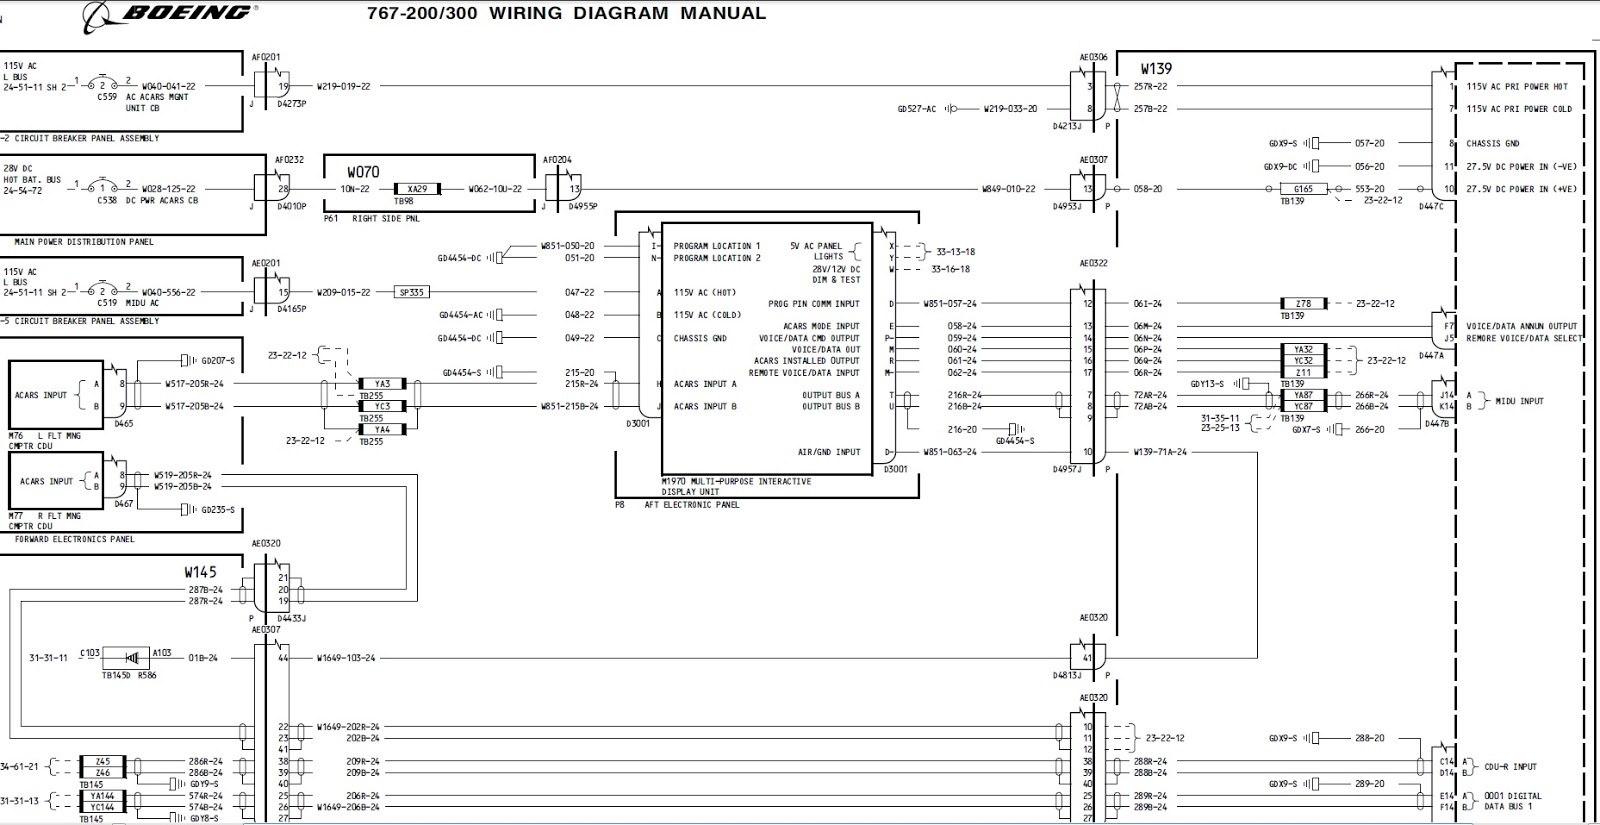 boeing wiring diagram wiring diagram forward boeing wiring diagram manual boeing wiring diagrams [ 1600 x 825 Pixel ]